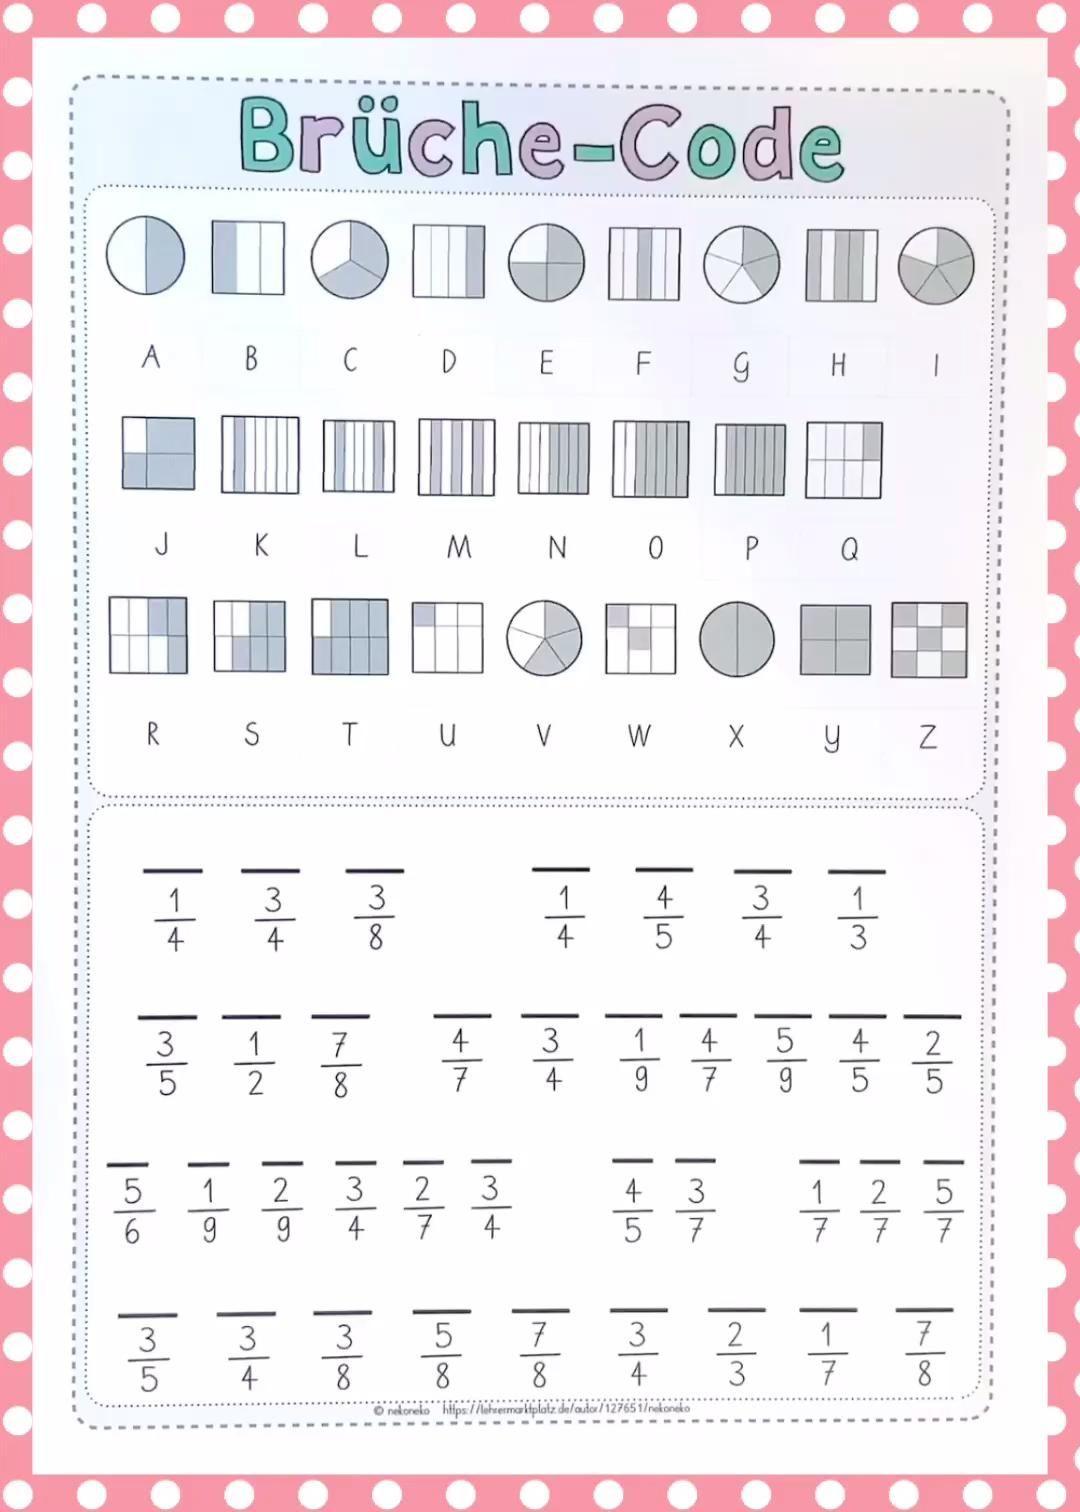 hight resolution of Bruchrechnen   Knacke den Brüche-Code   Division#brüchecode #bruchrechnen  #den #division #knacke   Math worksheets